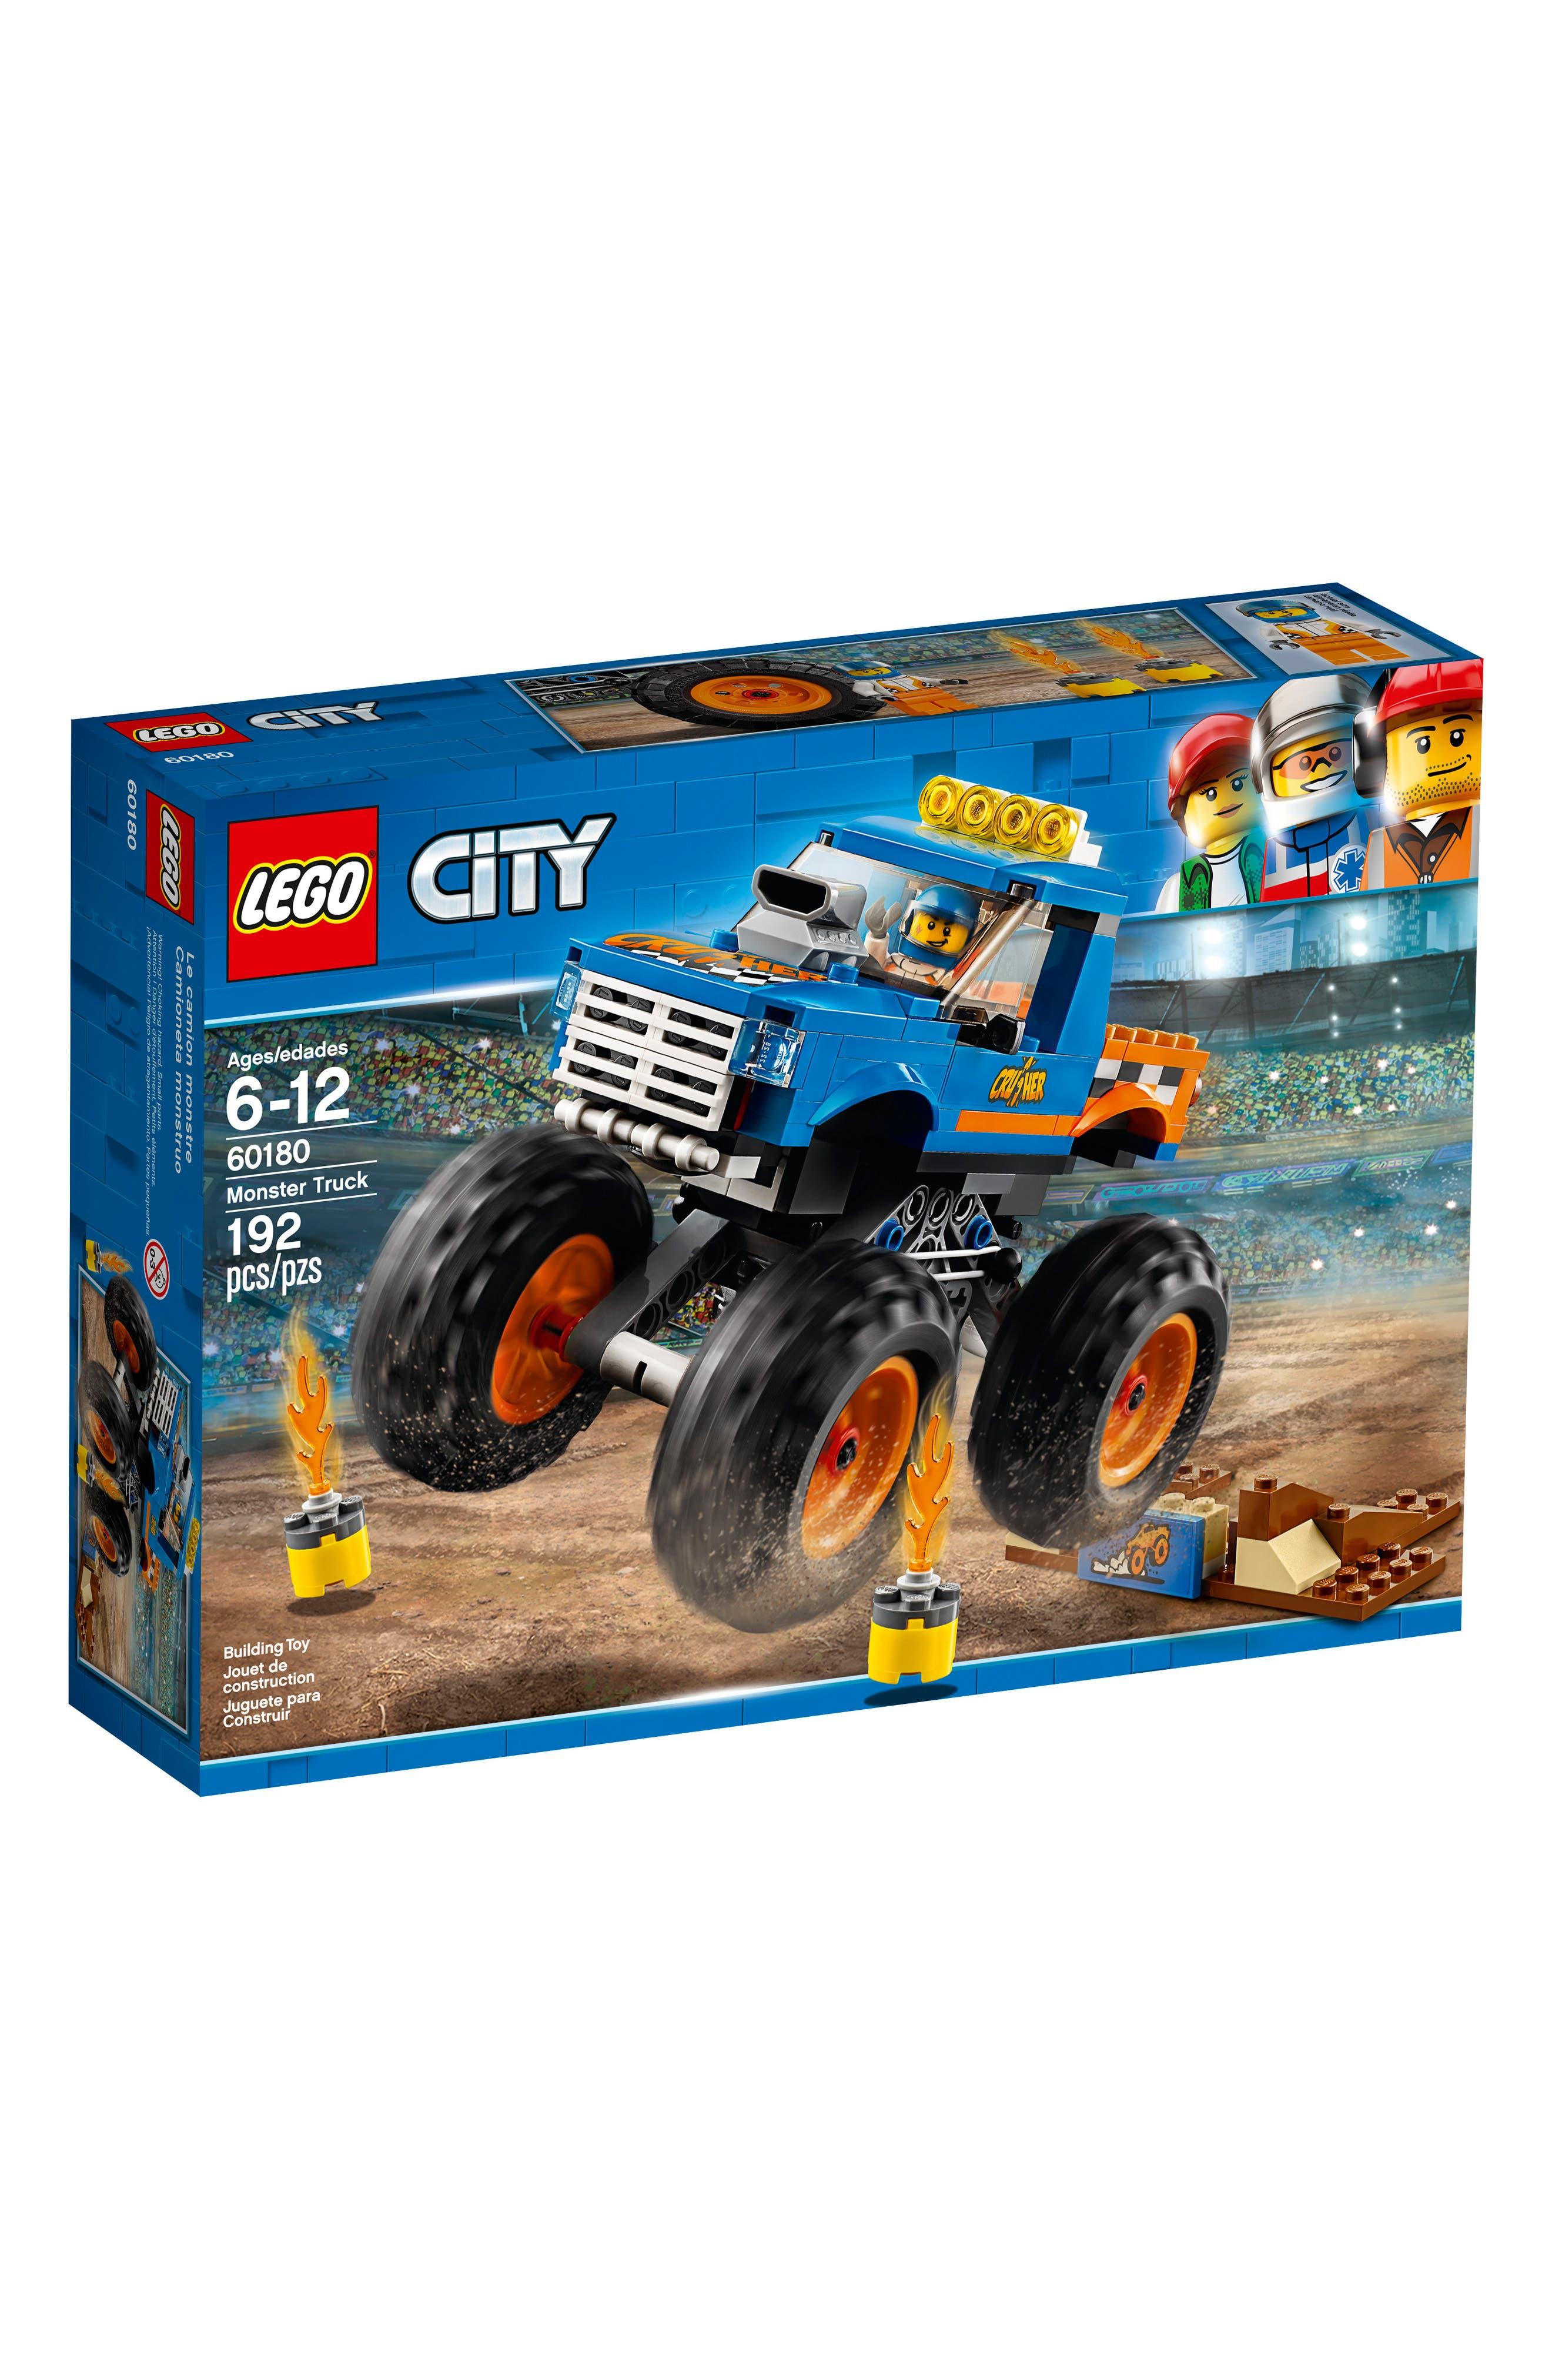 City Monster Truck - 60180,                             Main thumbnail 1, color,                             Multi